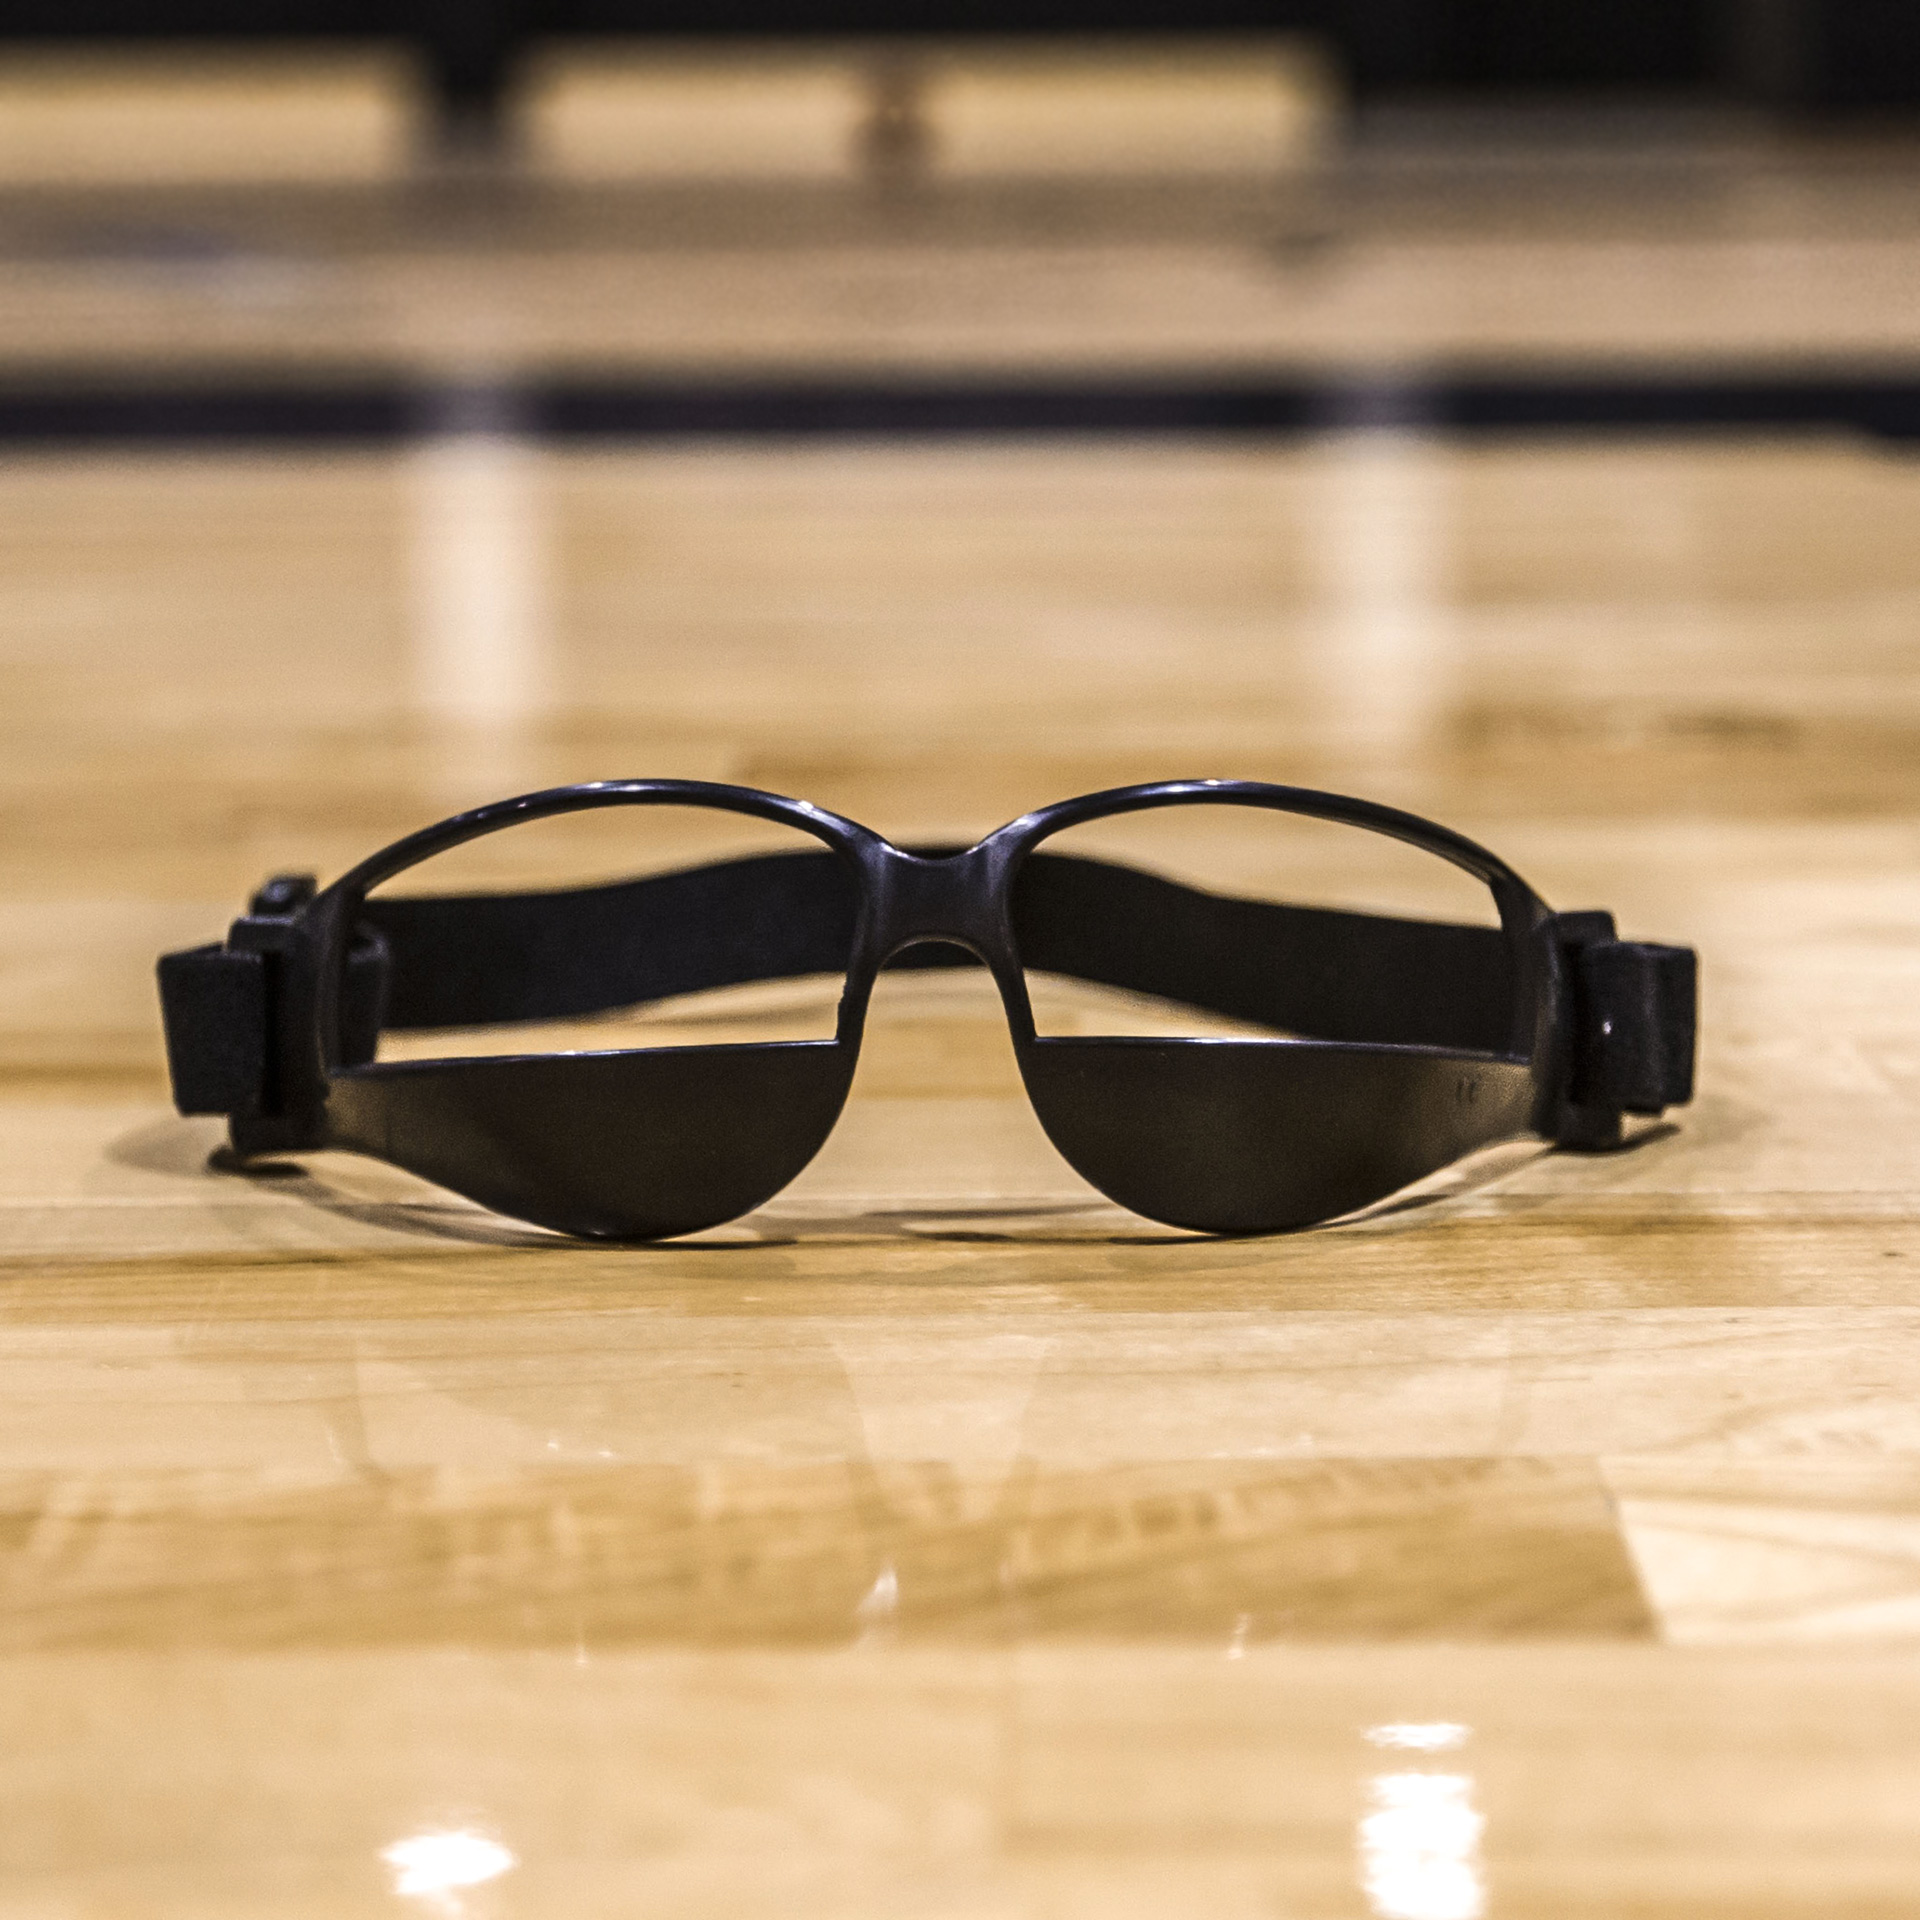 черный  тренажёр get ripped gr dribbling sunglasses GR-006-15 - цена, описание, фото 2